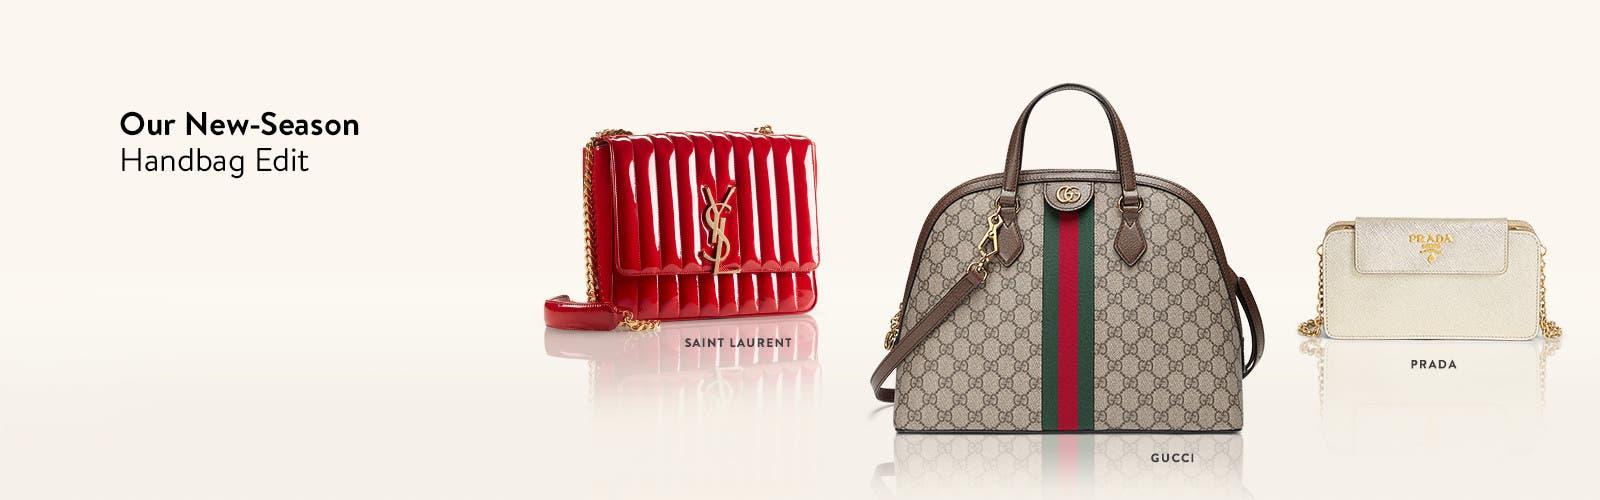 Our new-season handbag edit.